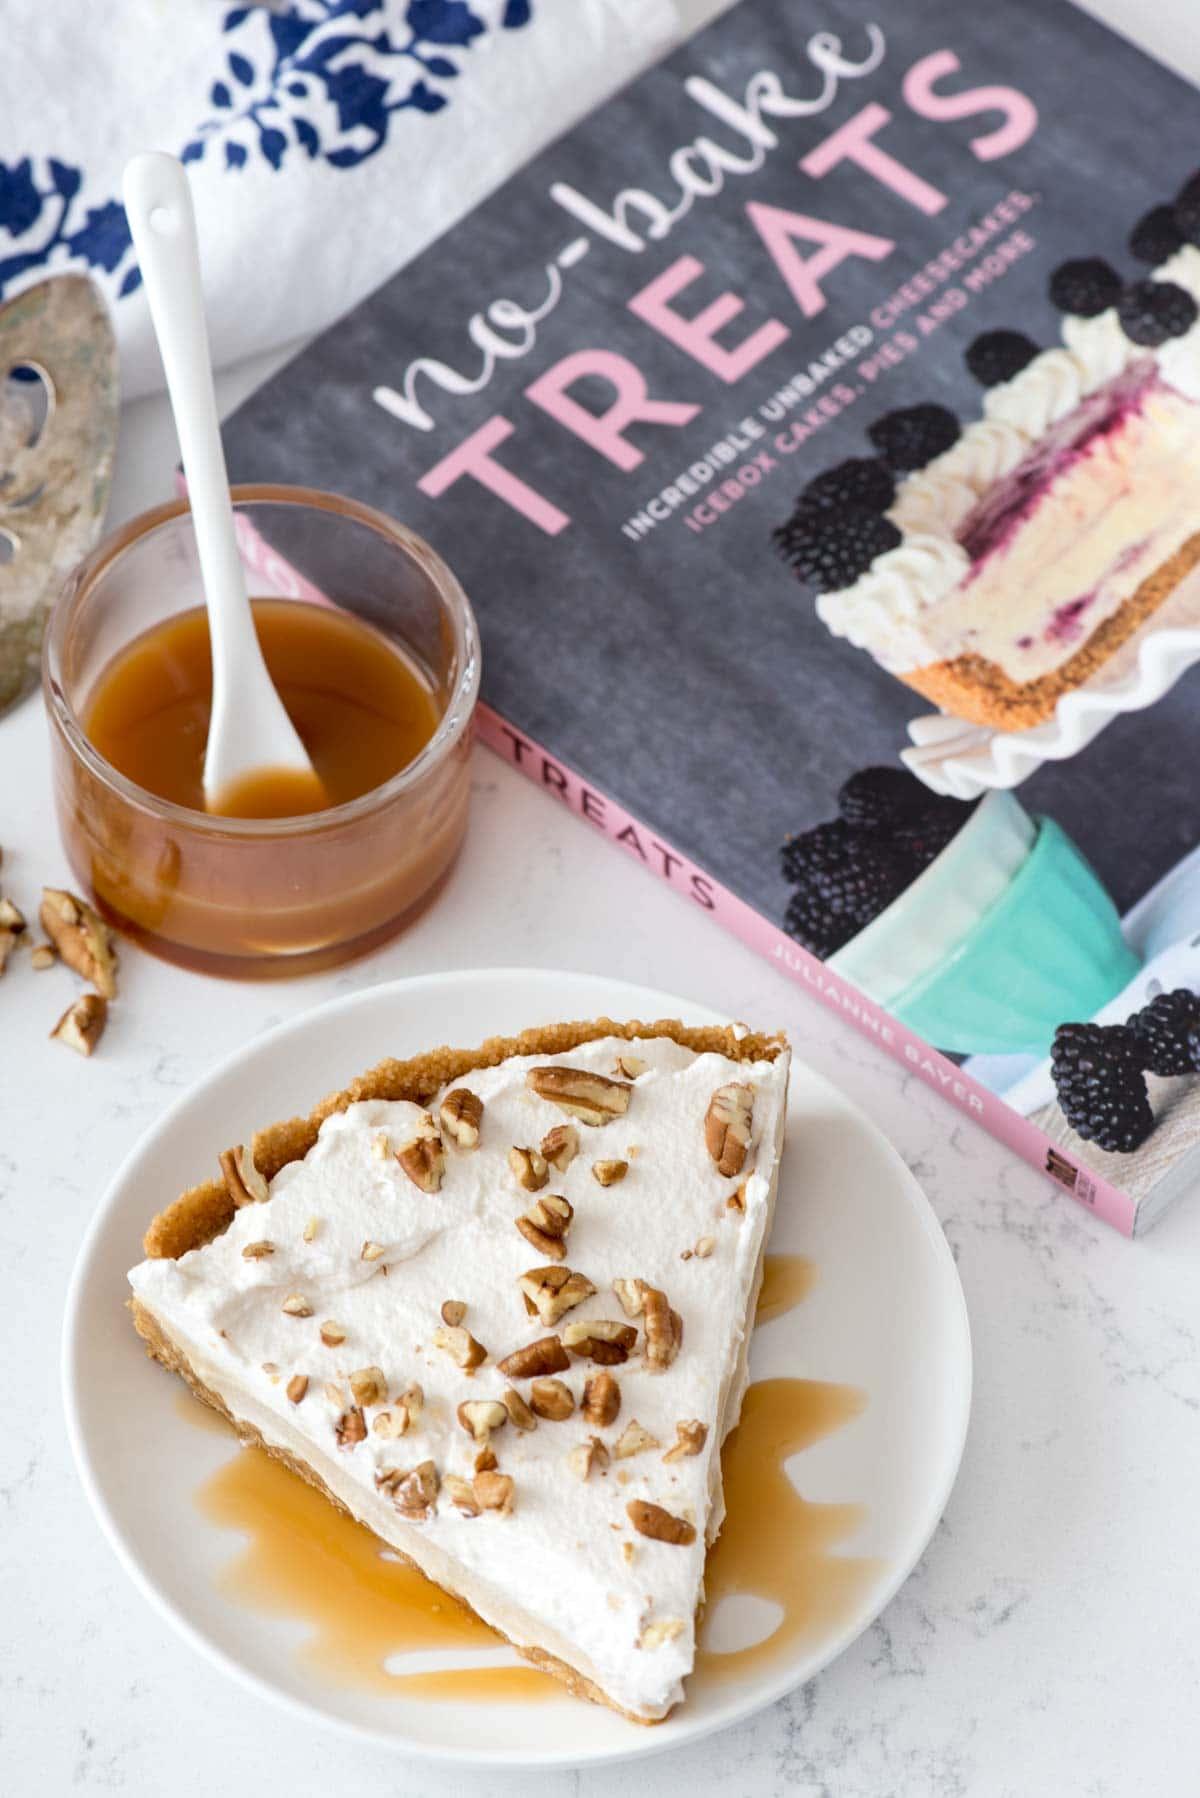 EASY No Bake Butterscotch Pie Recipe from No Bake Treats by Julianne Bayer